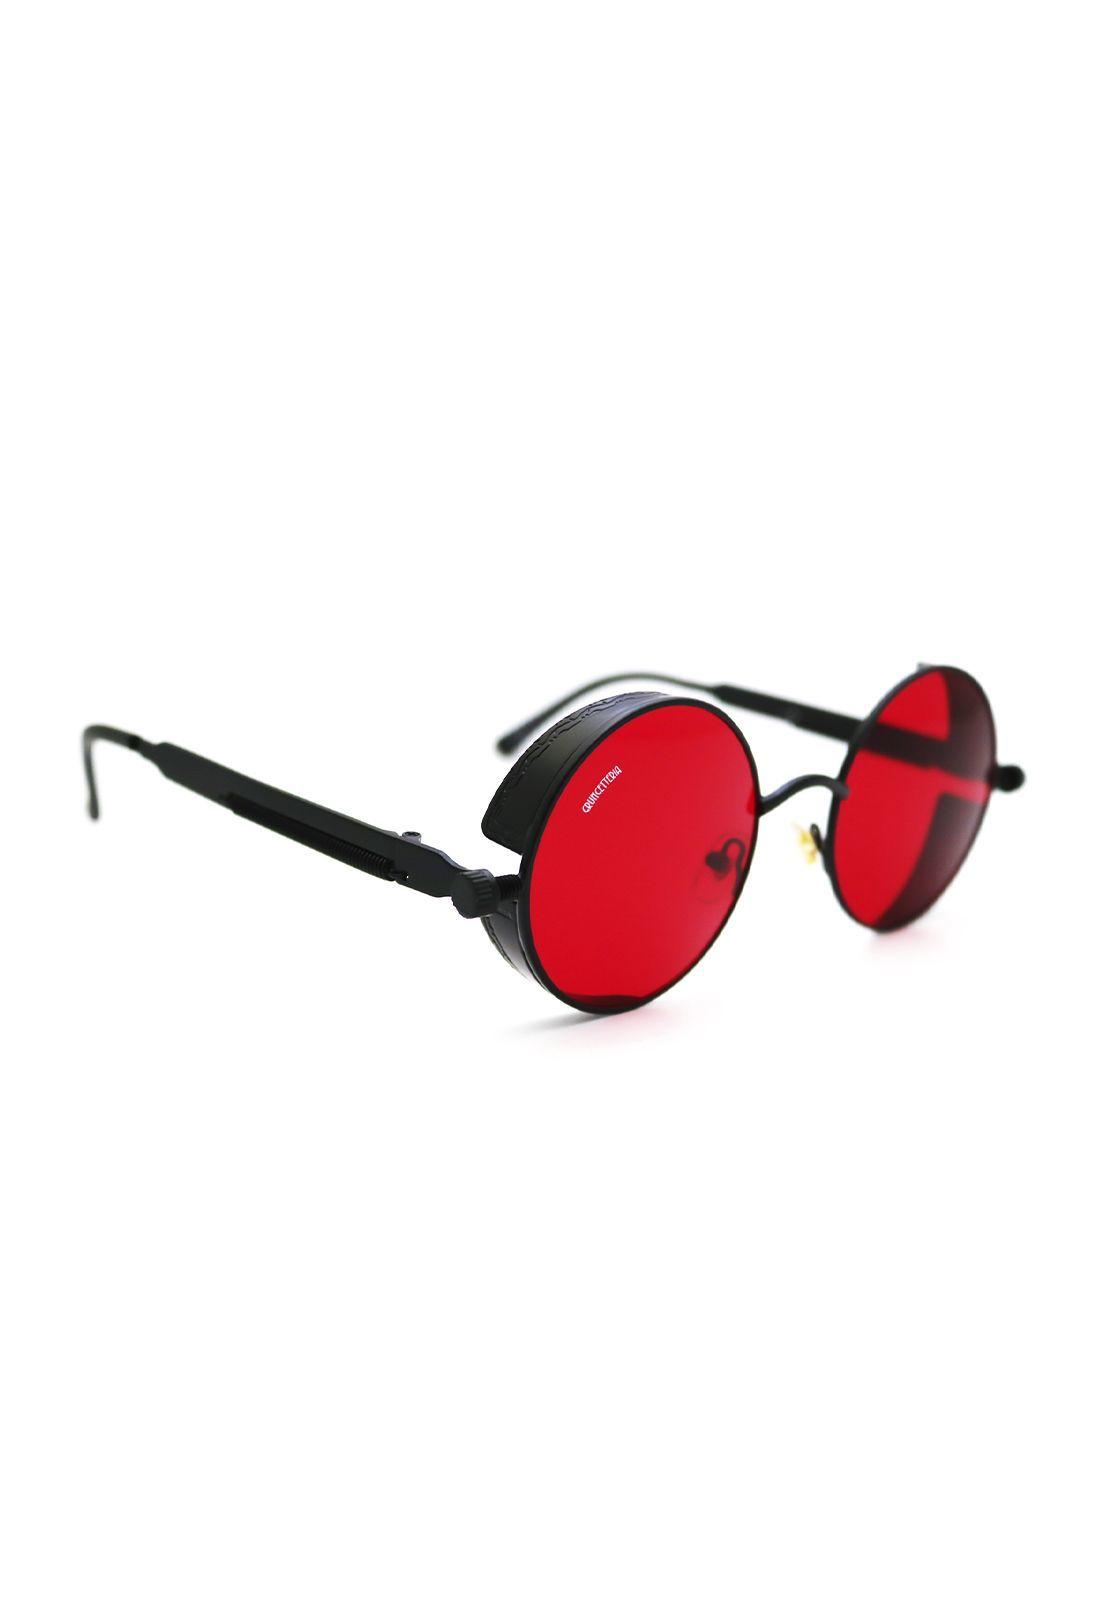 Óculos de Sol Grungetteria Sex Machine B/R